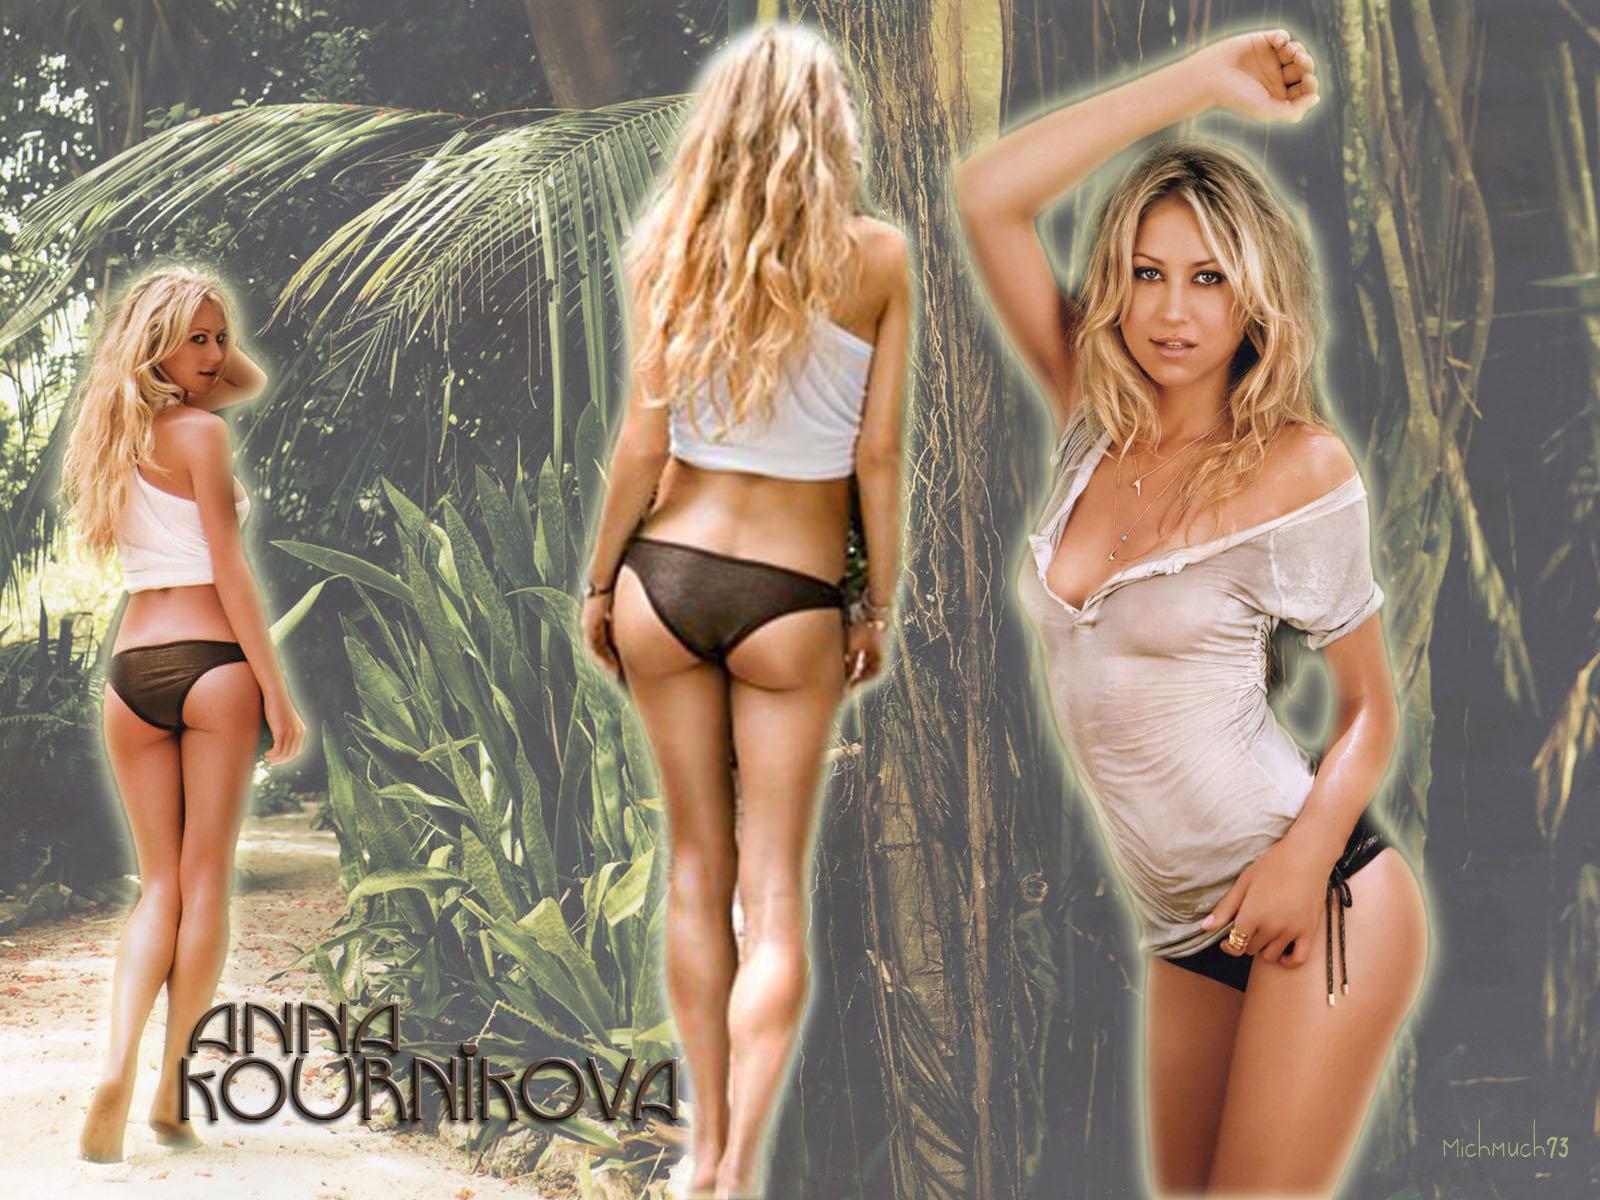 Anna Kournikova Sexy Photo 22